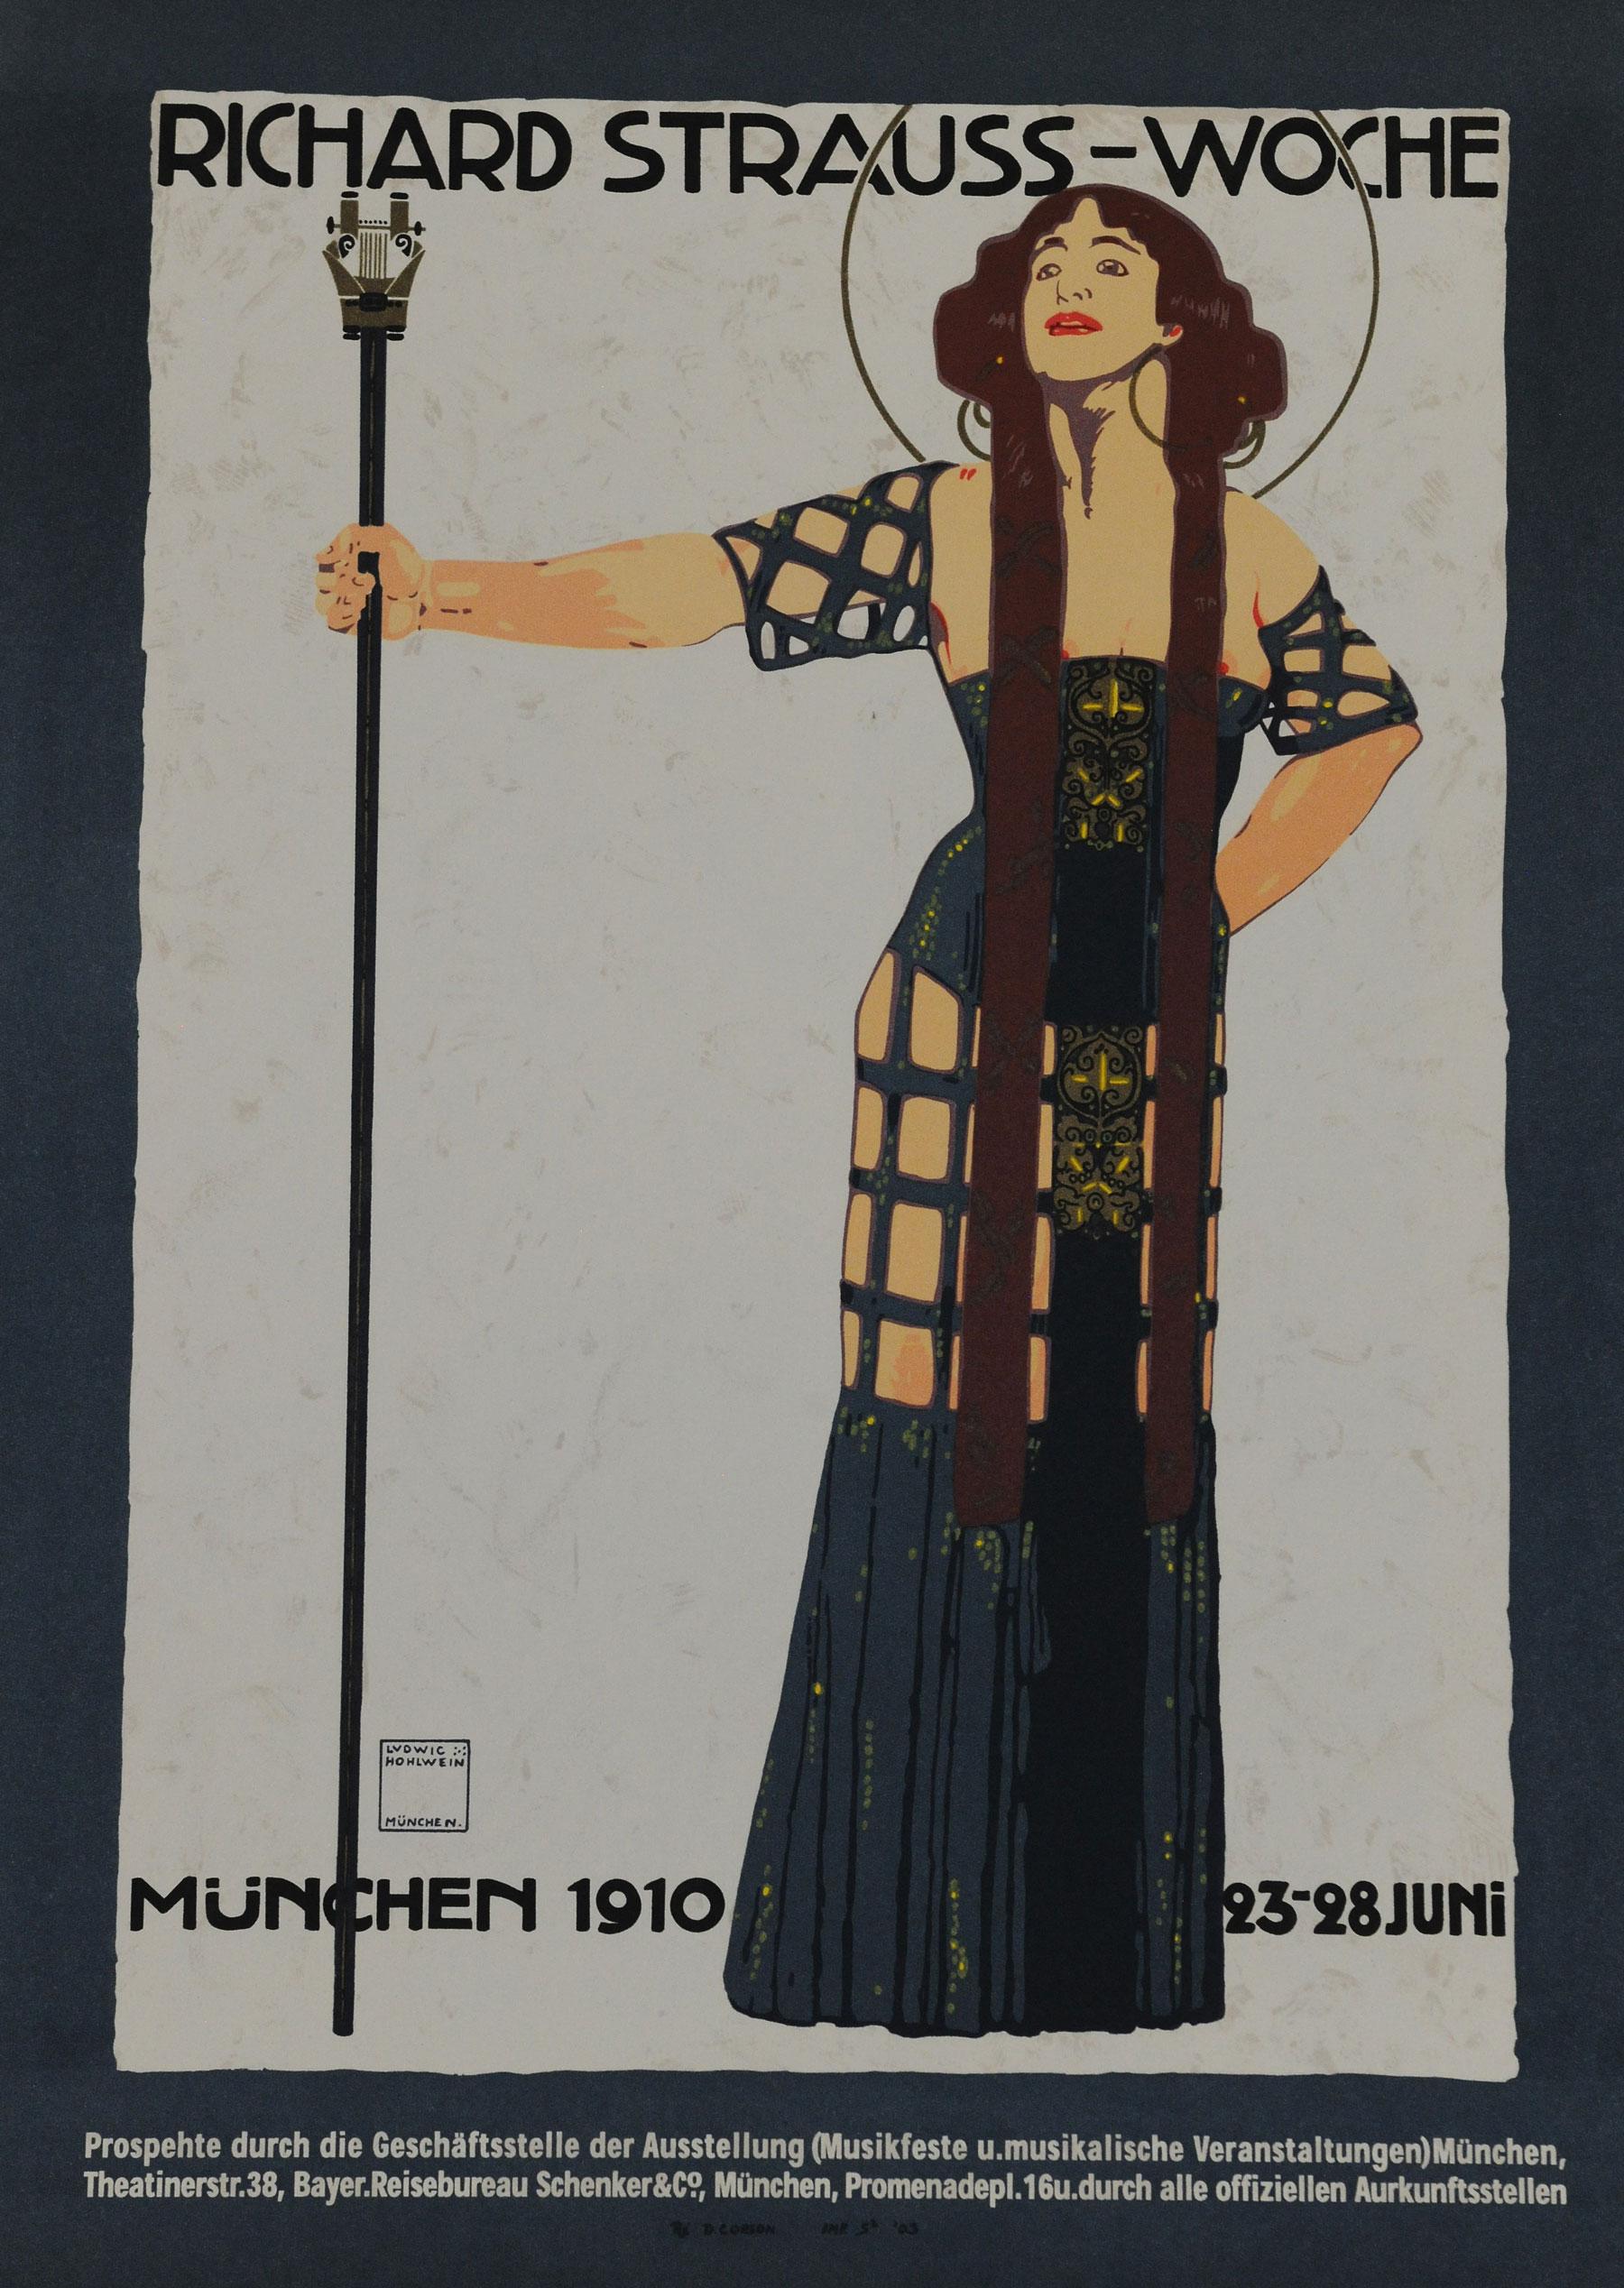 Munich art poster art deco woman holding staff 1910